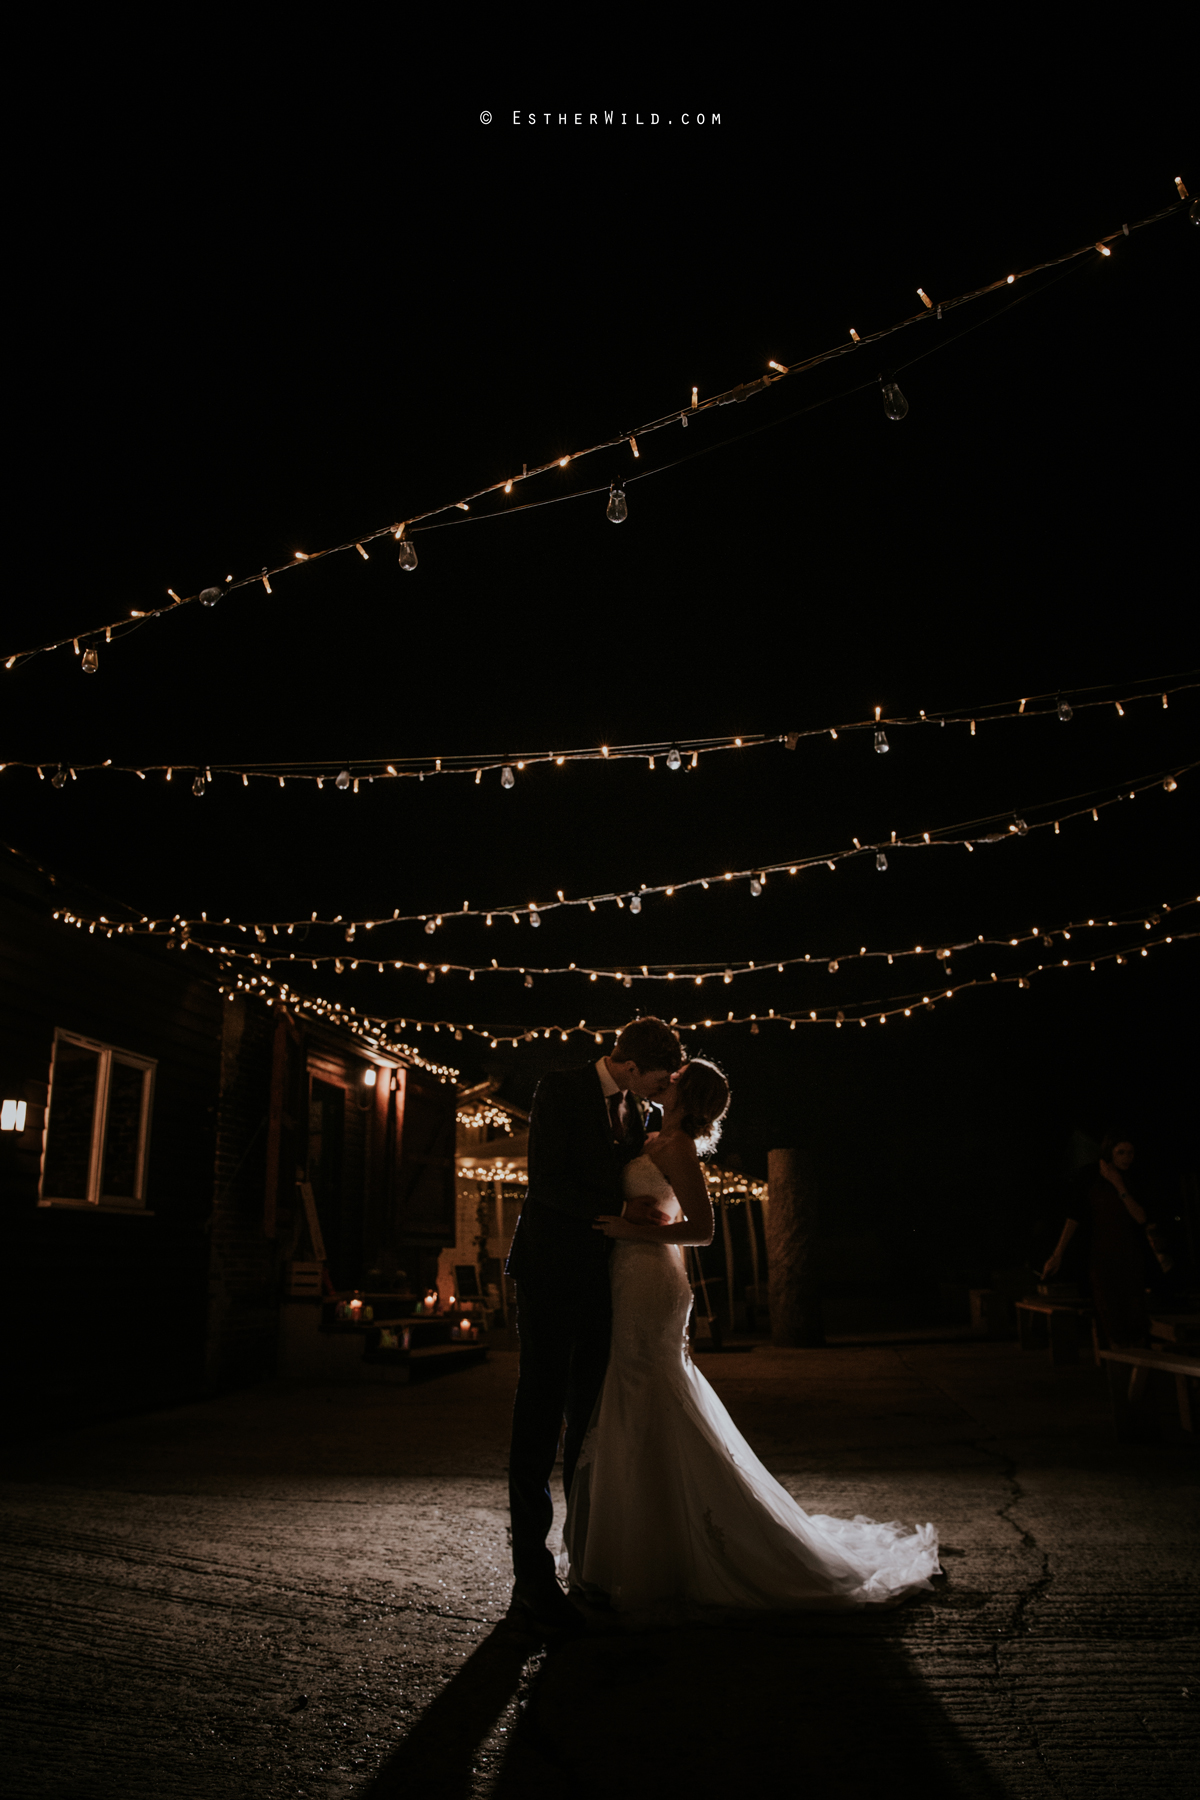 Glebe_Farm_Barn_Rustic_Norfolk_Wedding_Esther_Wild_Photographer_Copyright_IMG_3267.jpg